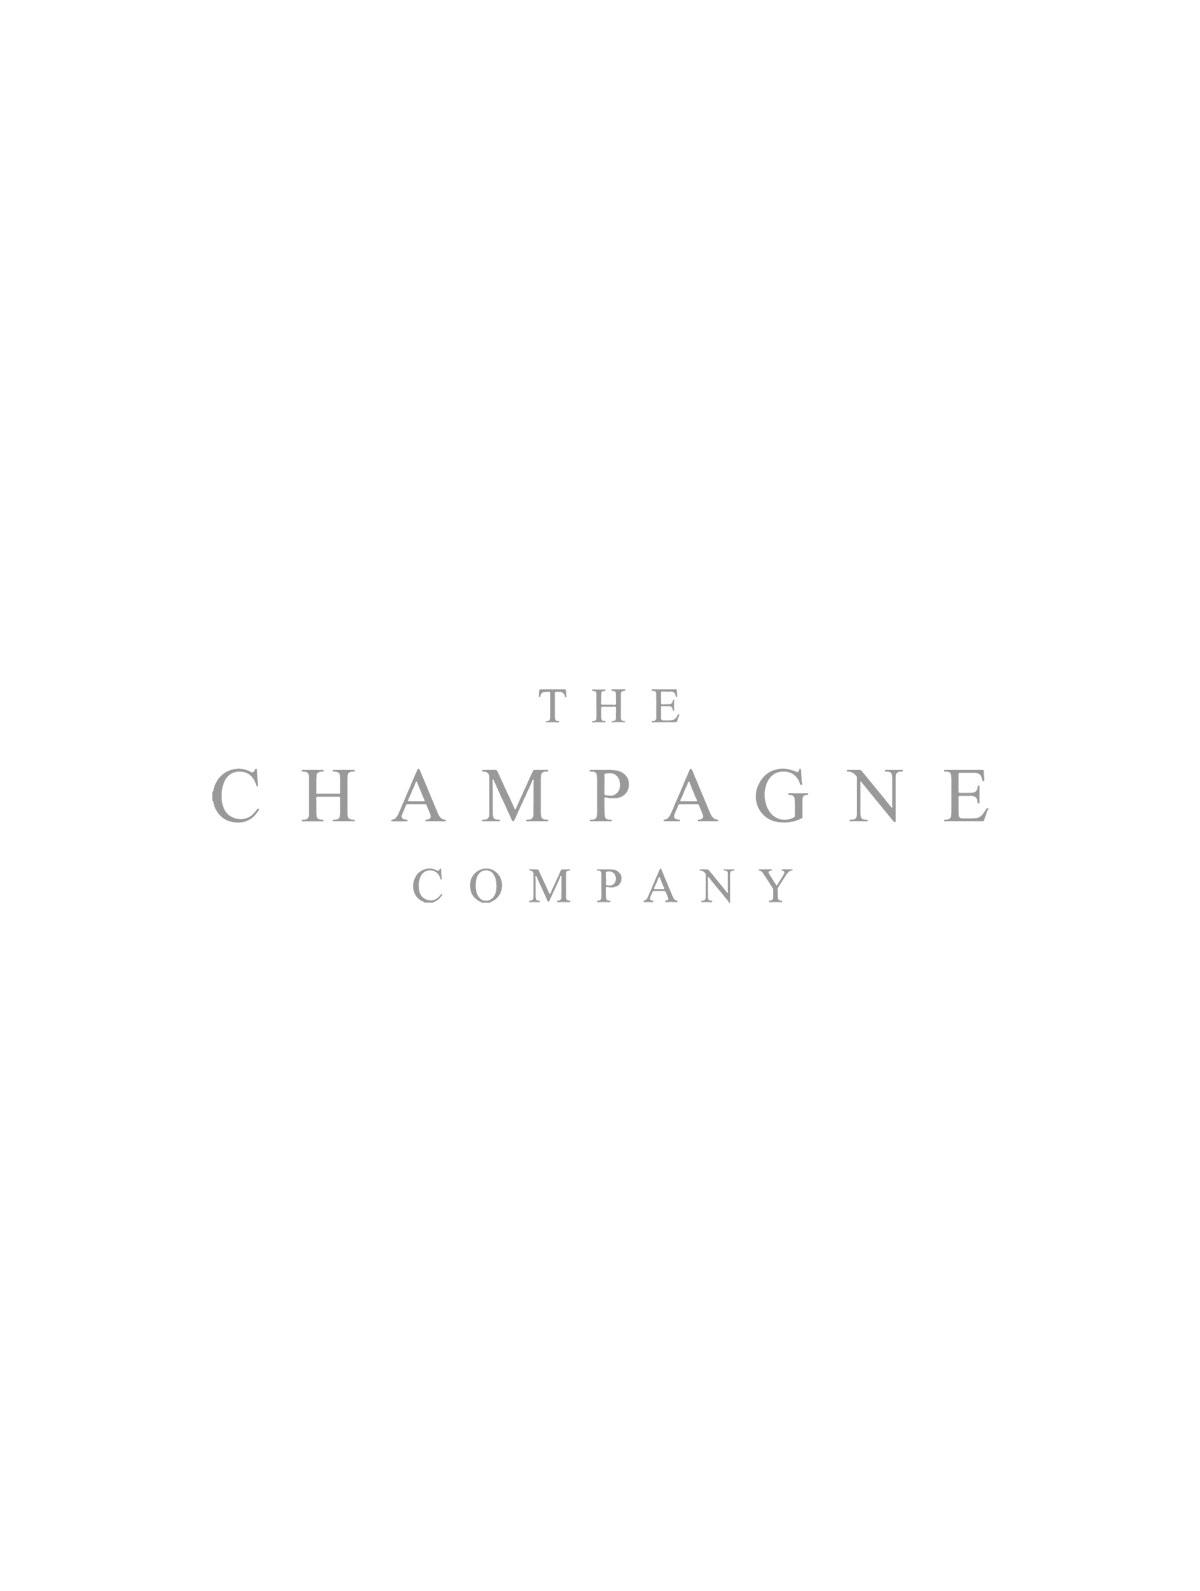 Laurent Perrier La Cuvee Champagne NV 75cl & Sea Salt Truffles 510g